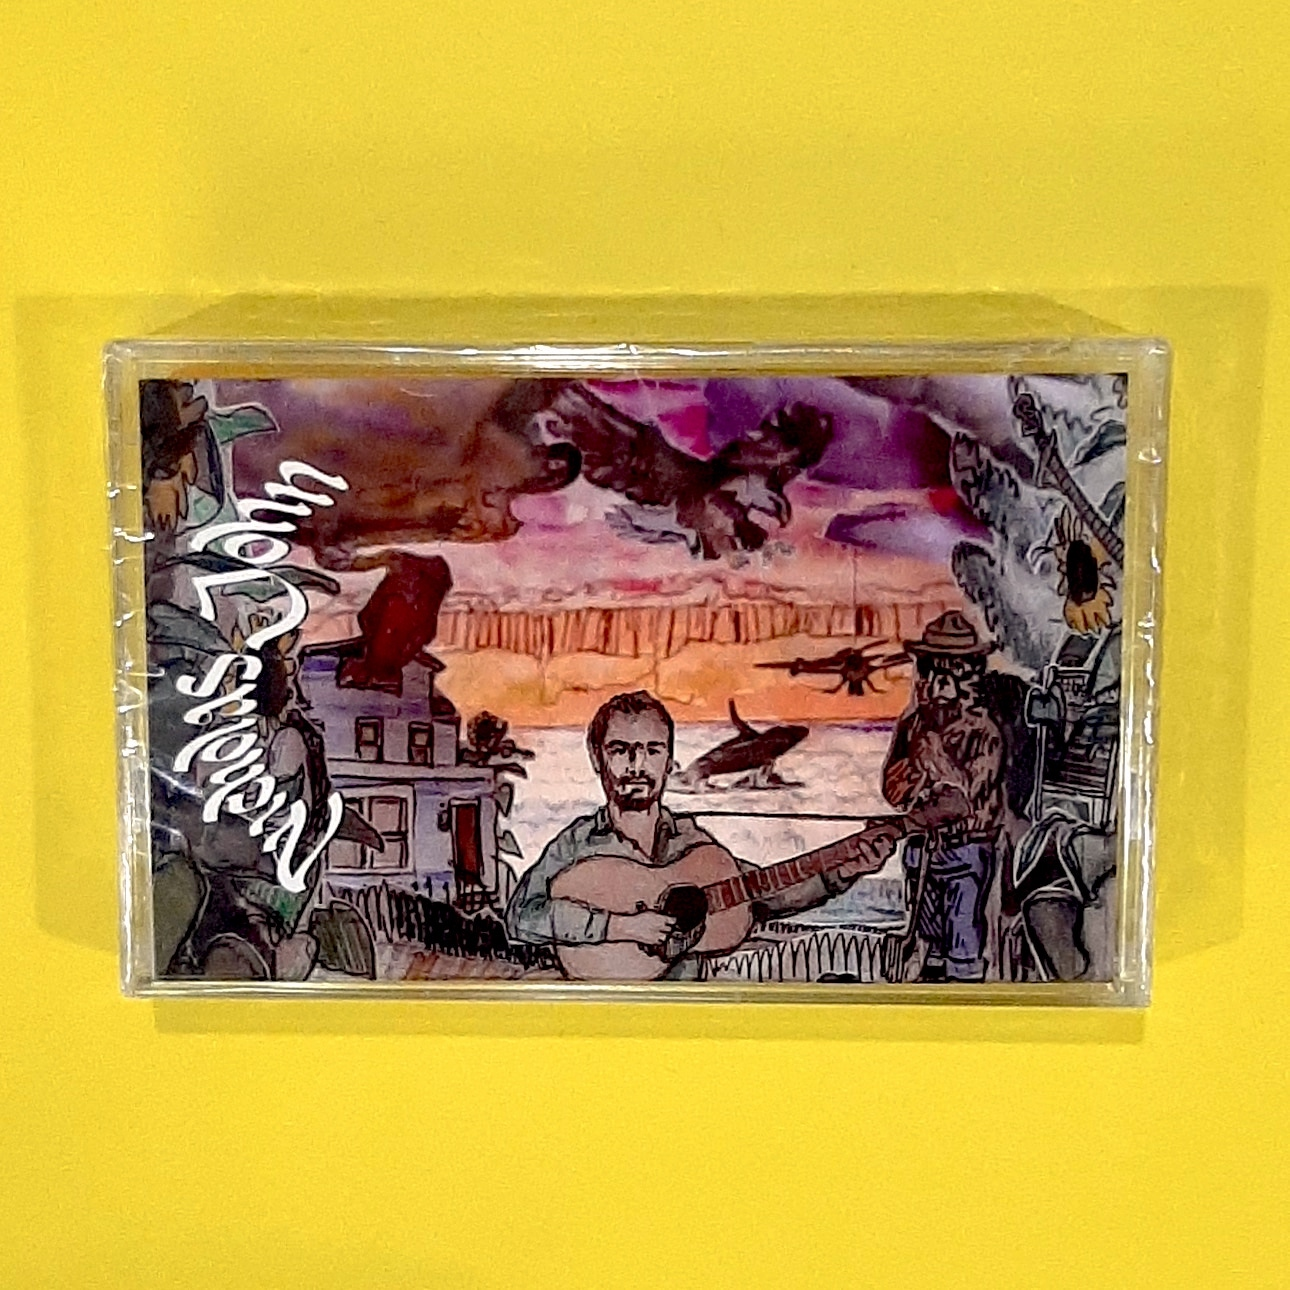 Nicholas John - Something I Made (Citrus City Records)